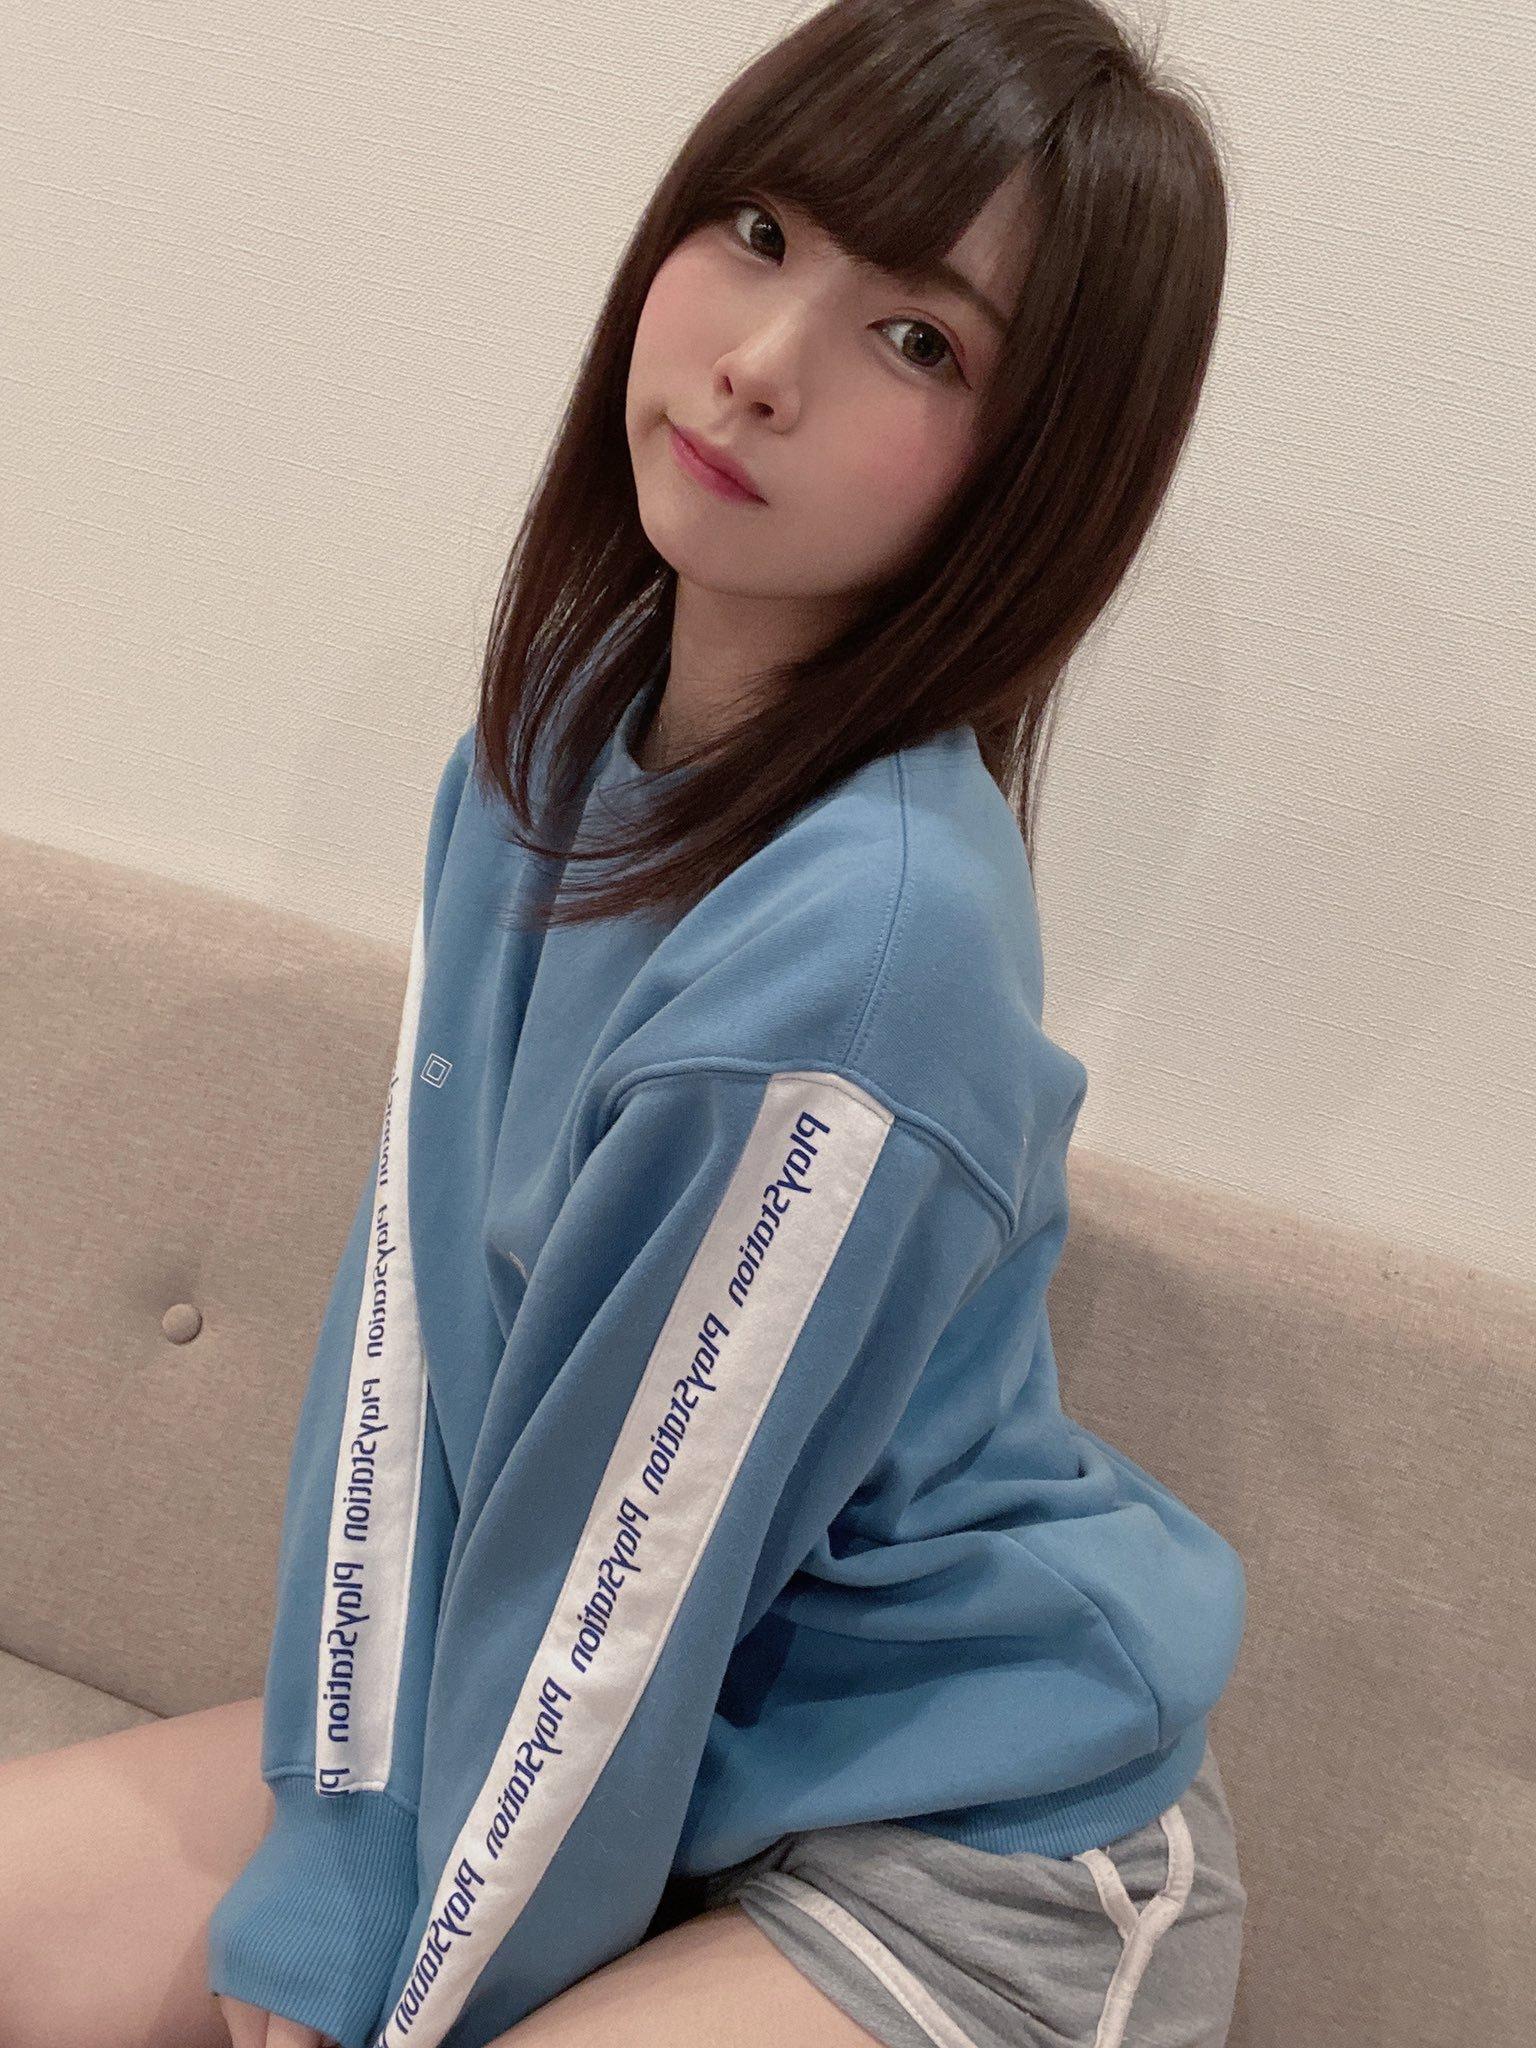 Enako@日本第一Coser的性感蜕变 养眼图片 第4张